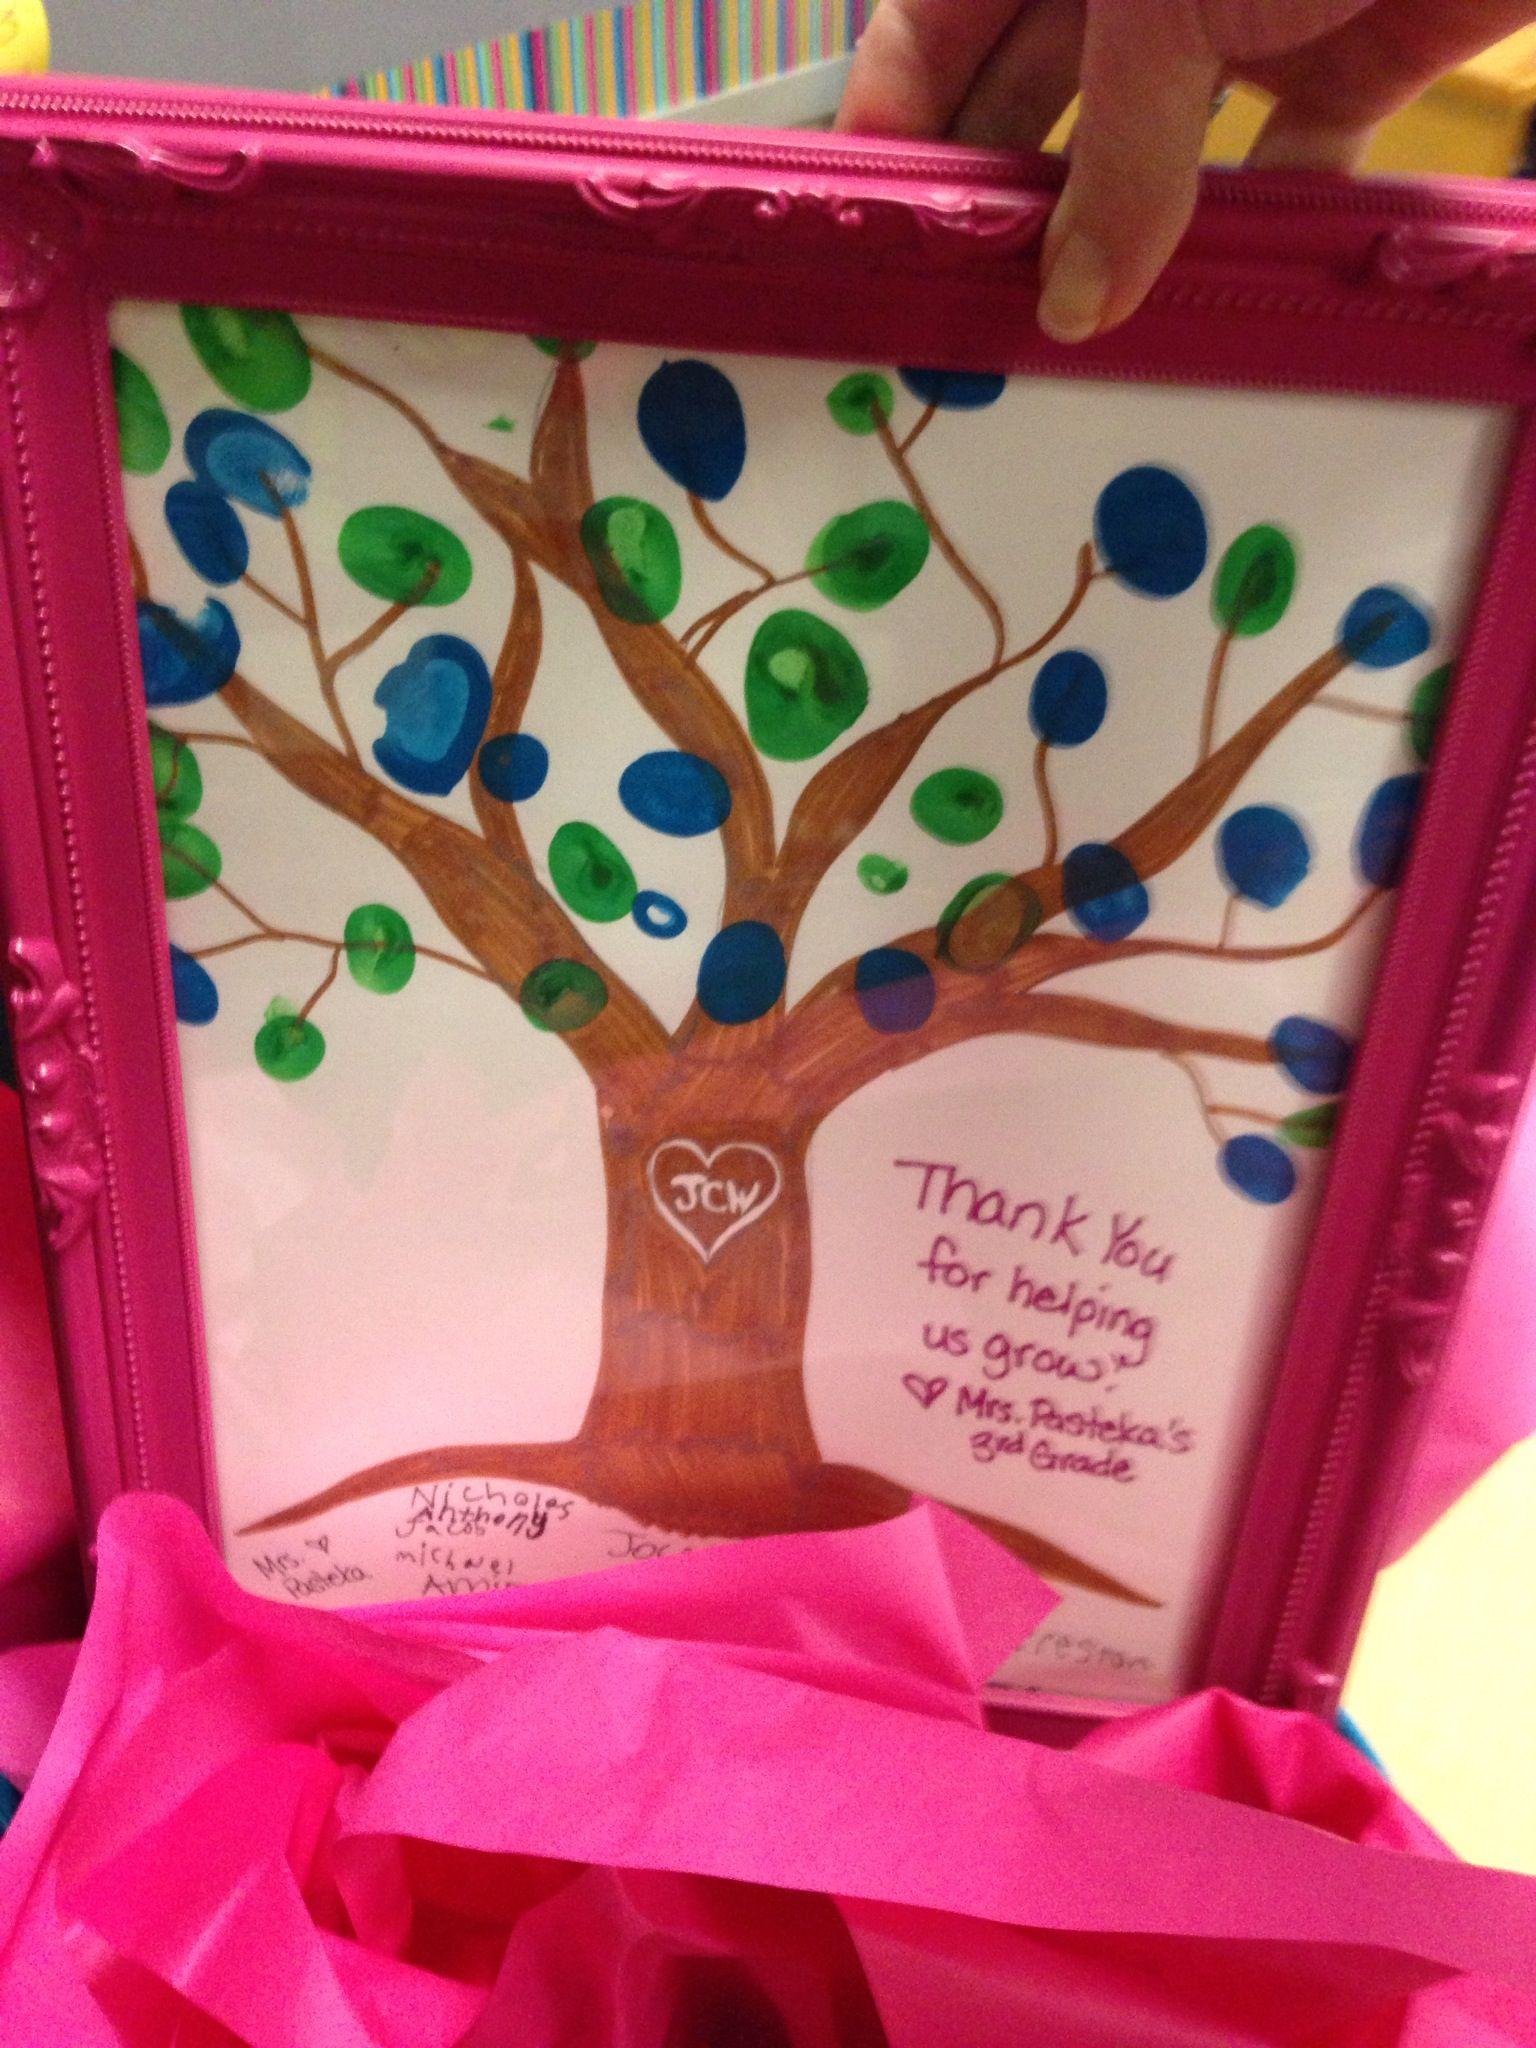 Gift for my student teacher | School ideas | Pinterest ...